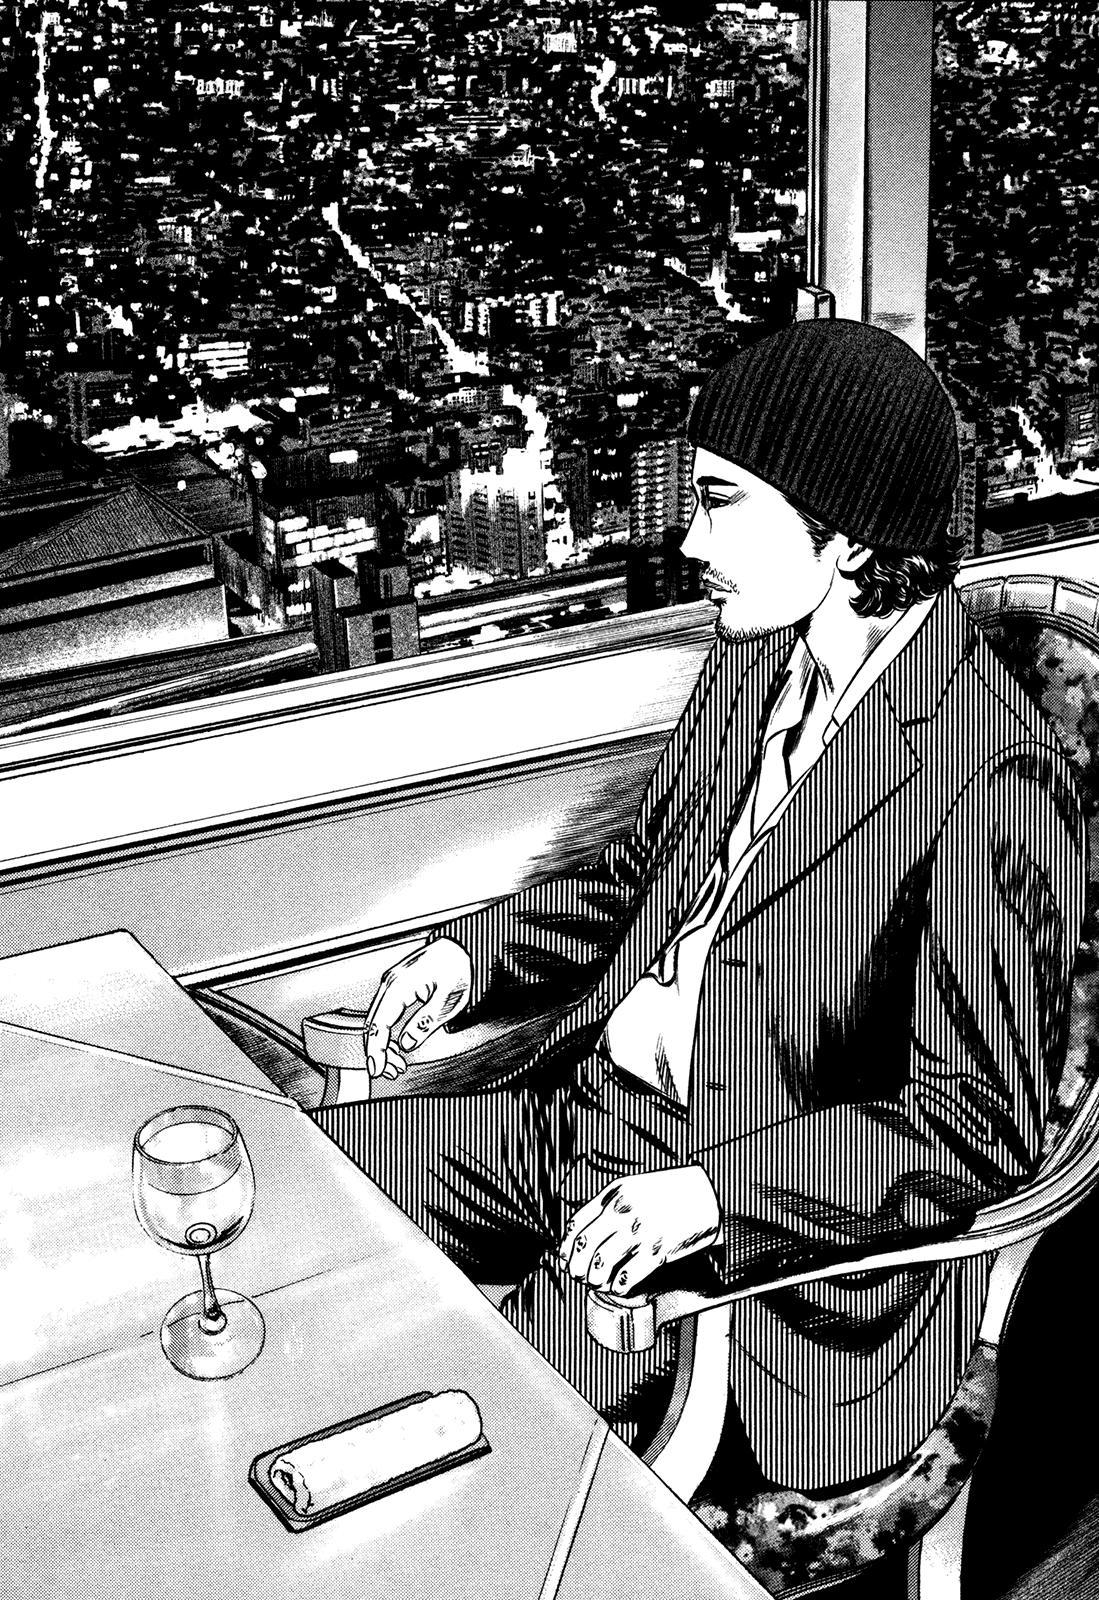 https://r1.ninemanga.com/comics/pic2/37/29413/294416/146162467122.jpg Page 1